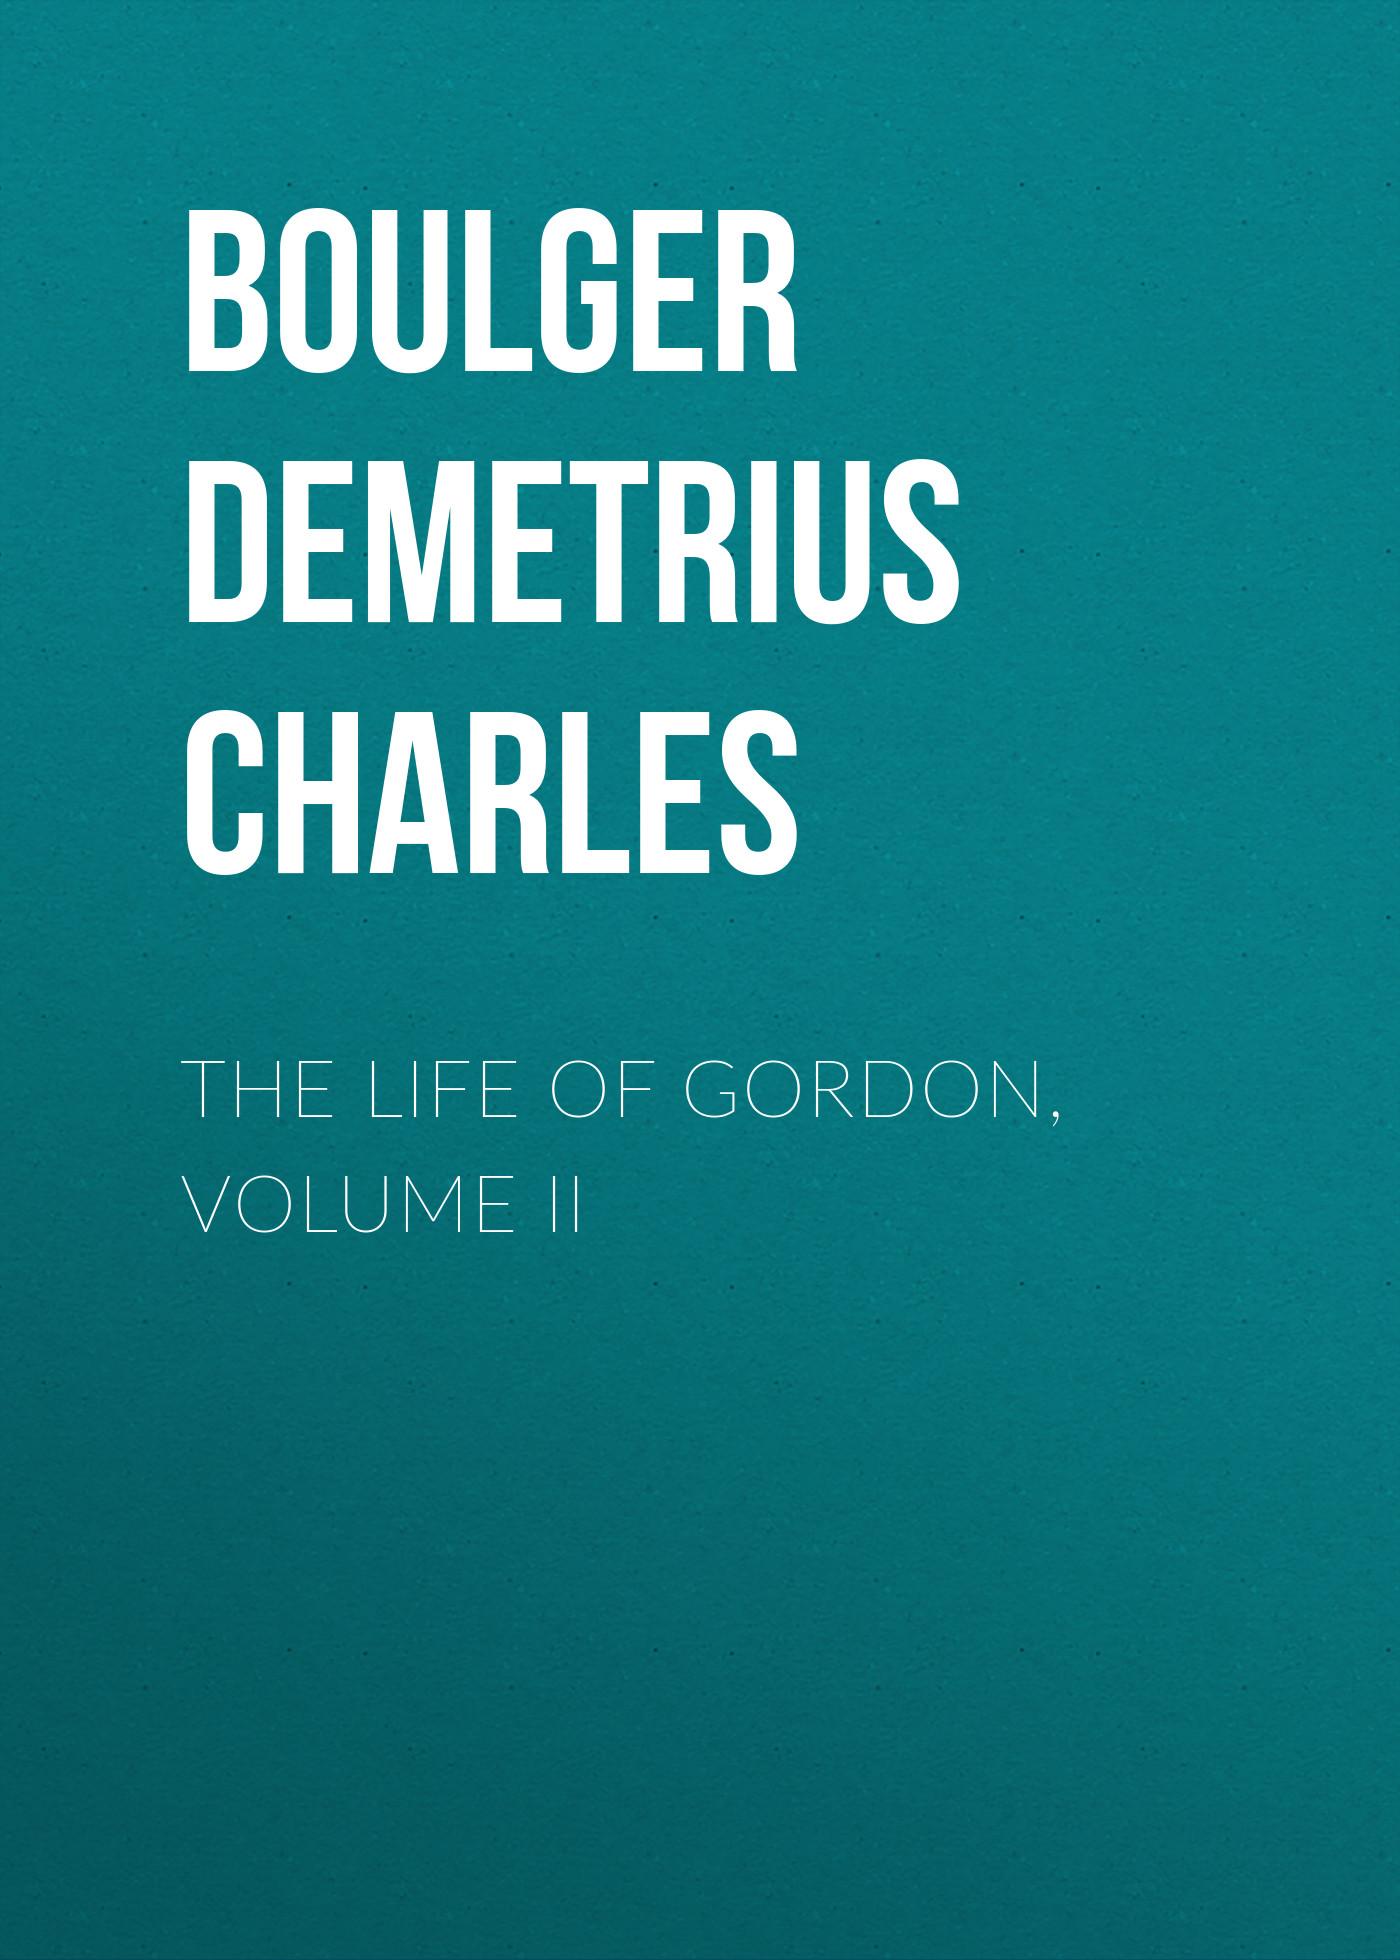 Boulger Demetrius Charles The Life of Gordon, Volume II